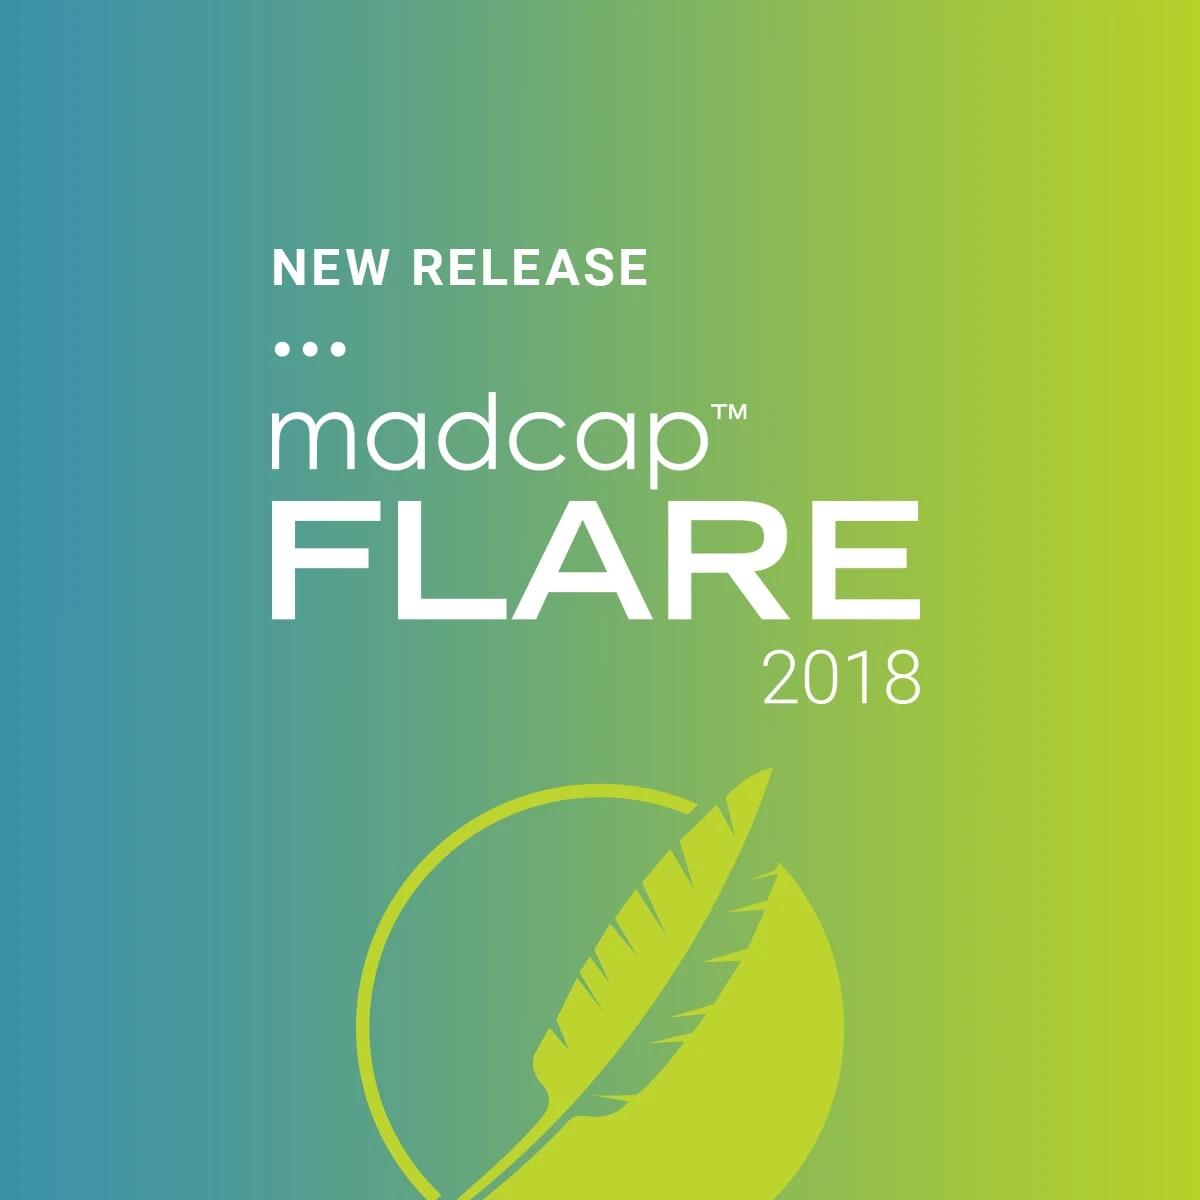 New Release MadCap Flare 2018